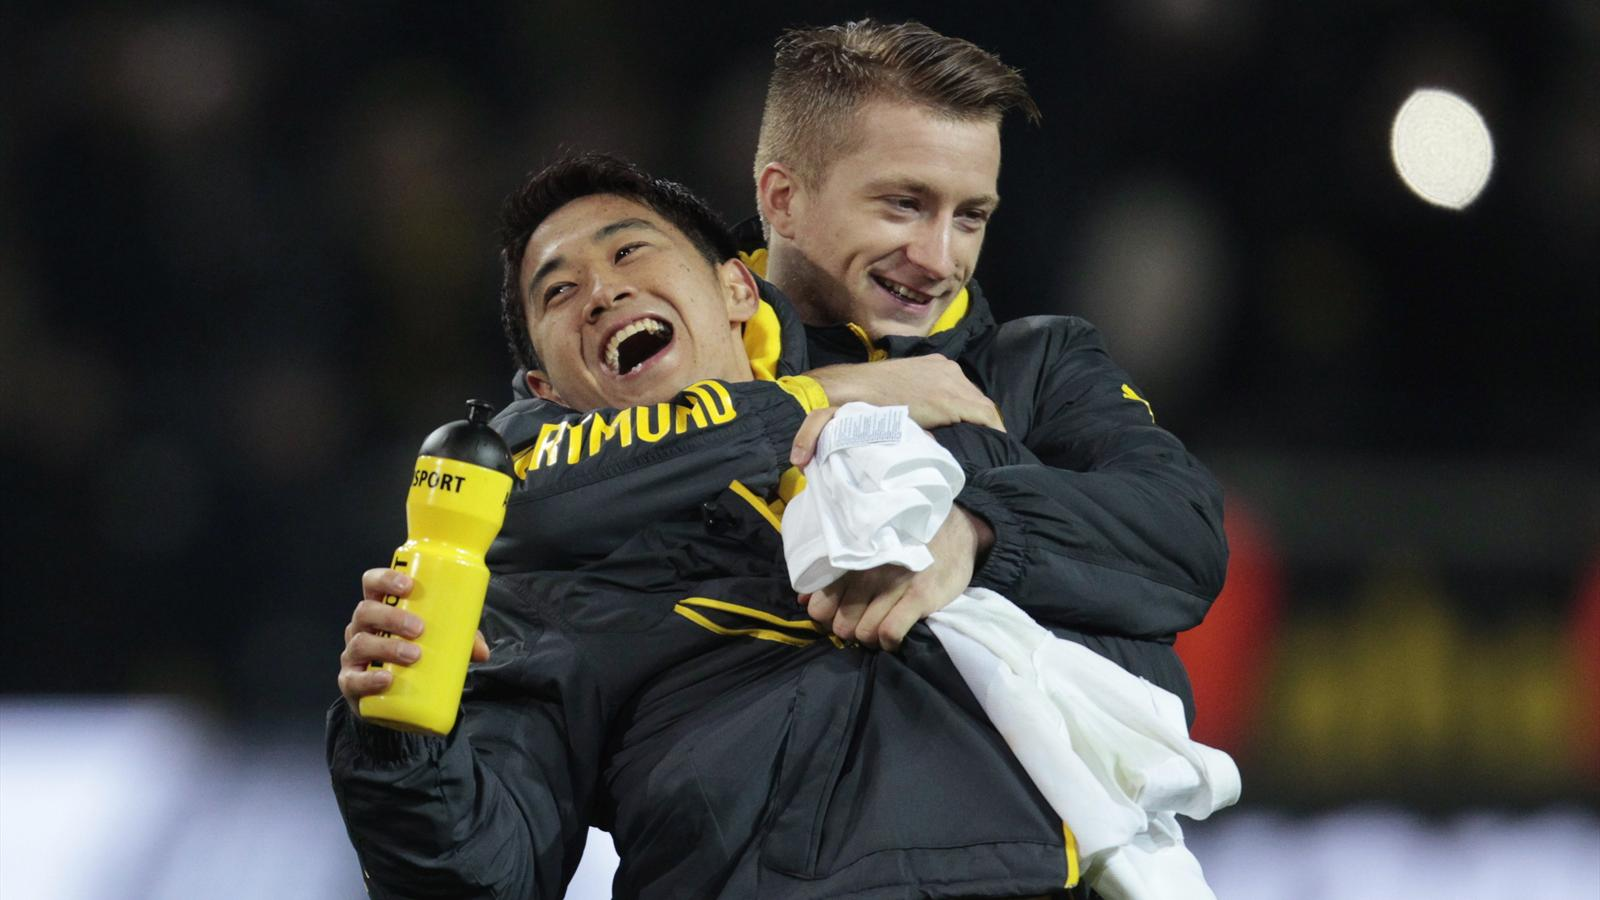 Borussia Dortmund's Marco Reus (R) hugs Shinji Kagawa after their Bundesliga match against Mainz 05 (Reuters)